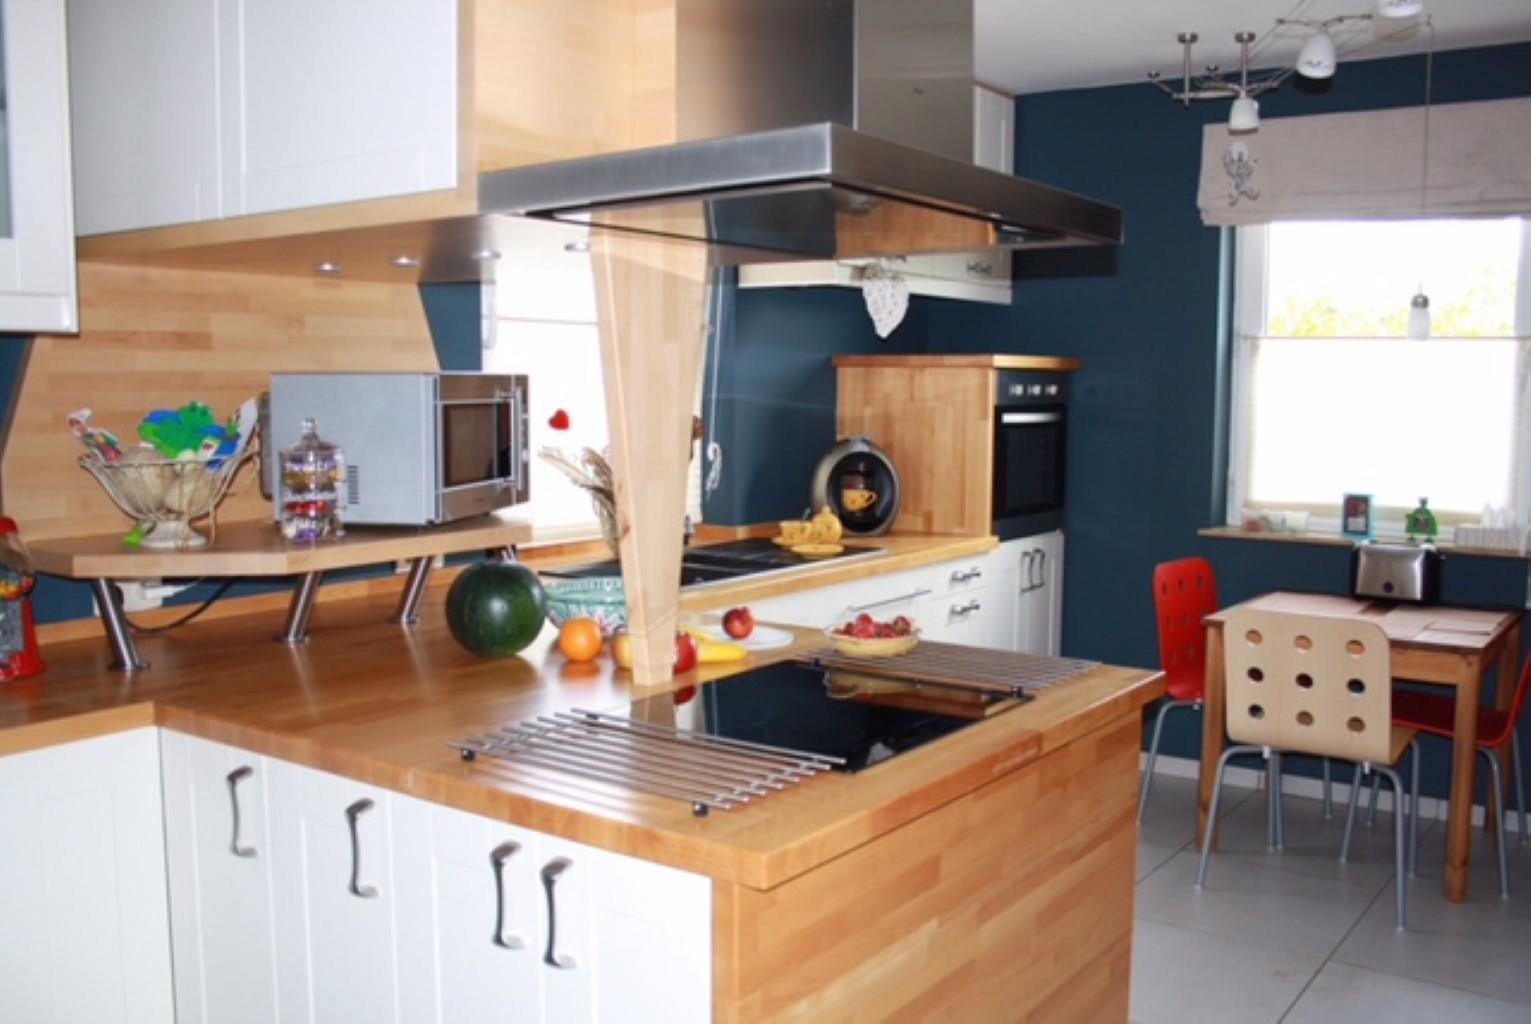 House - Villersla-Ville Tilly - #2038007-8